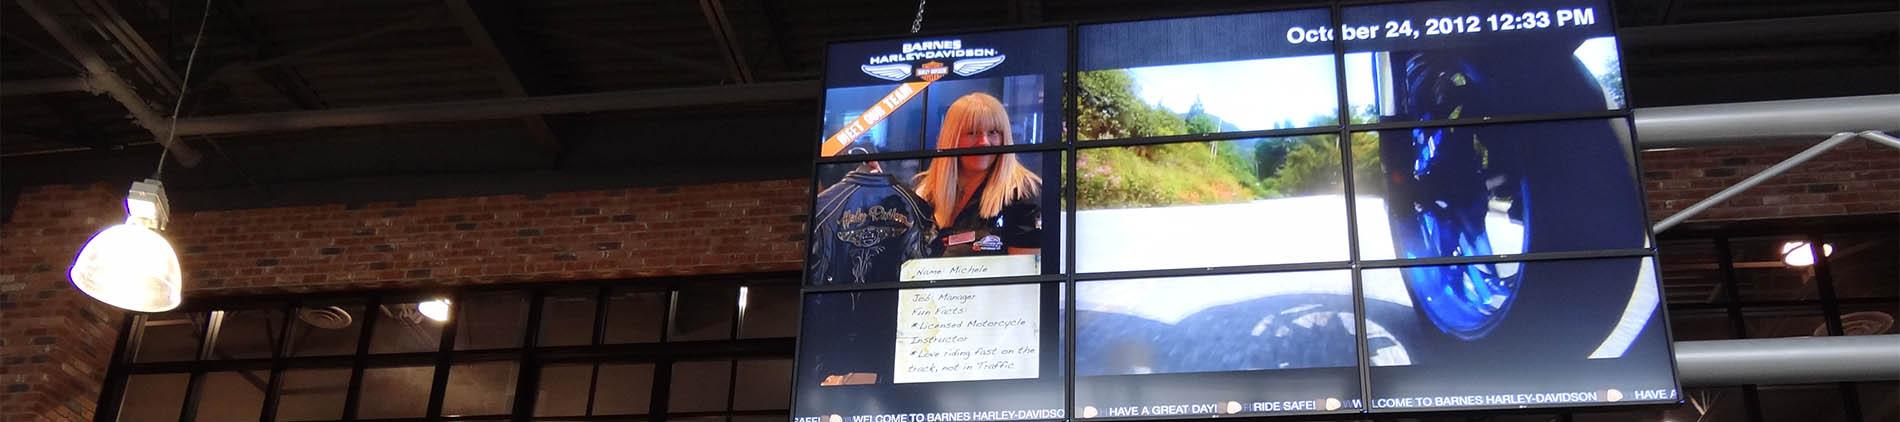 Commercial, 9UP, Display, Harley, Davidson,video walls, resturants,bars